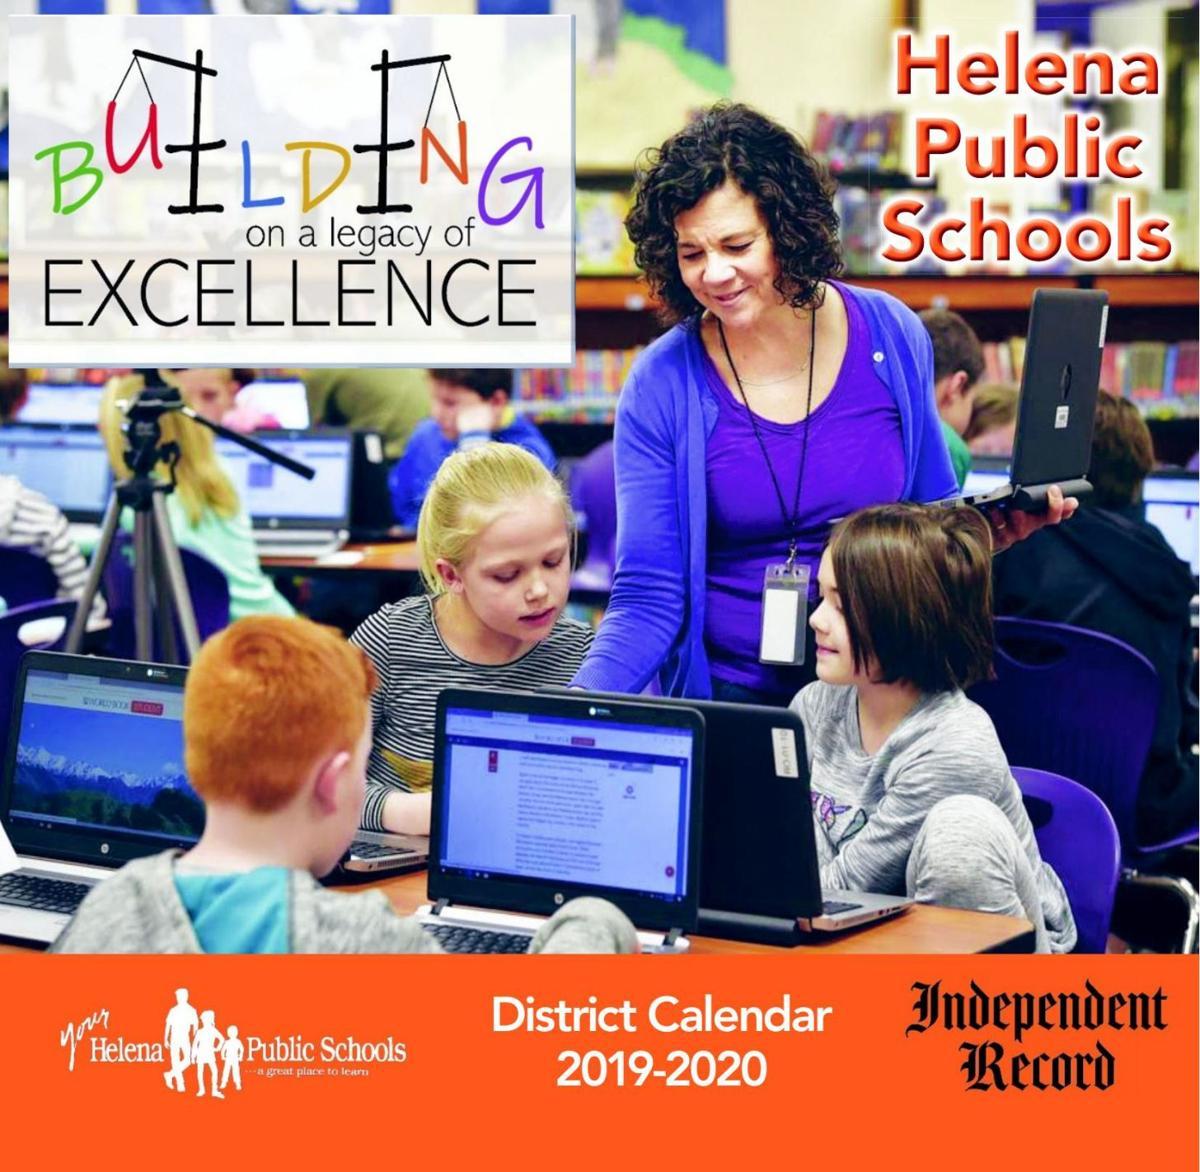 Helena School Calendar 2019-2020